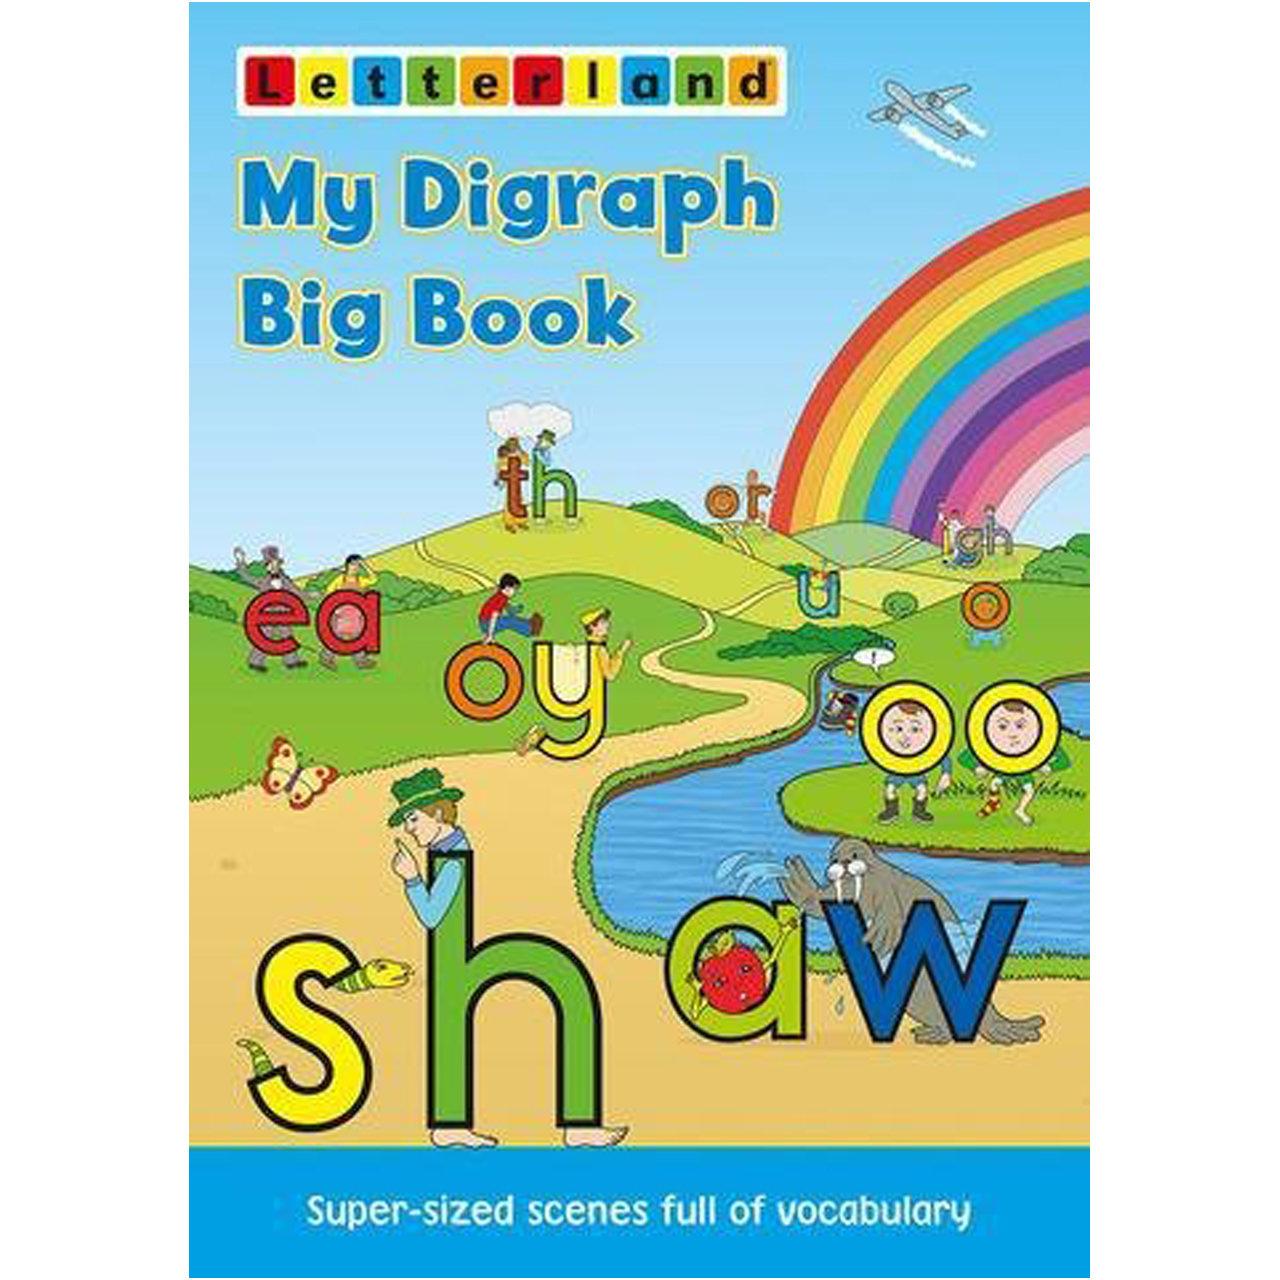 My Digraph Big Book (Big Book for Fix-it Phonics Level 2 & 3)